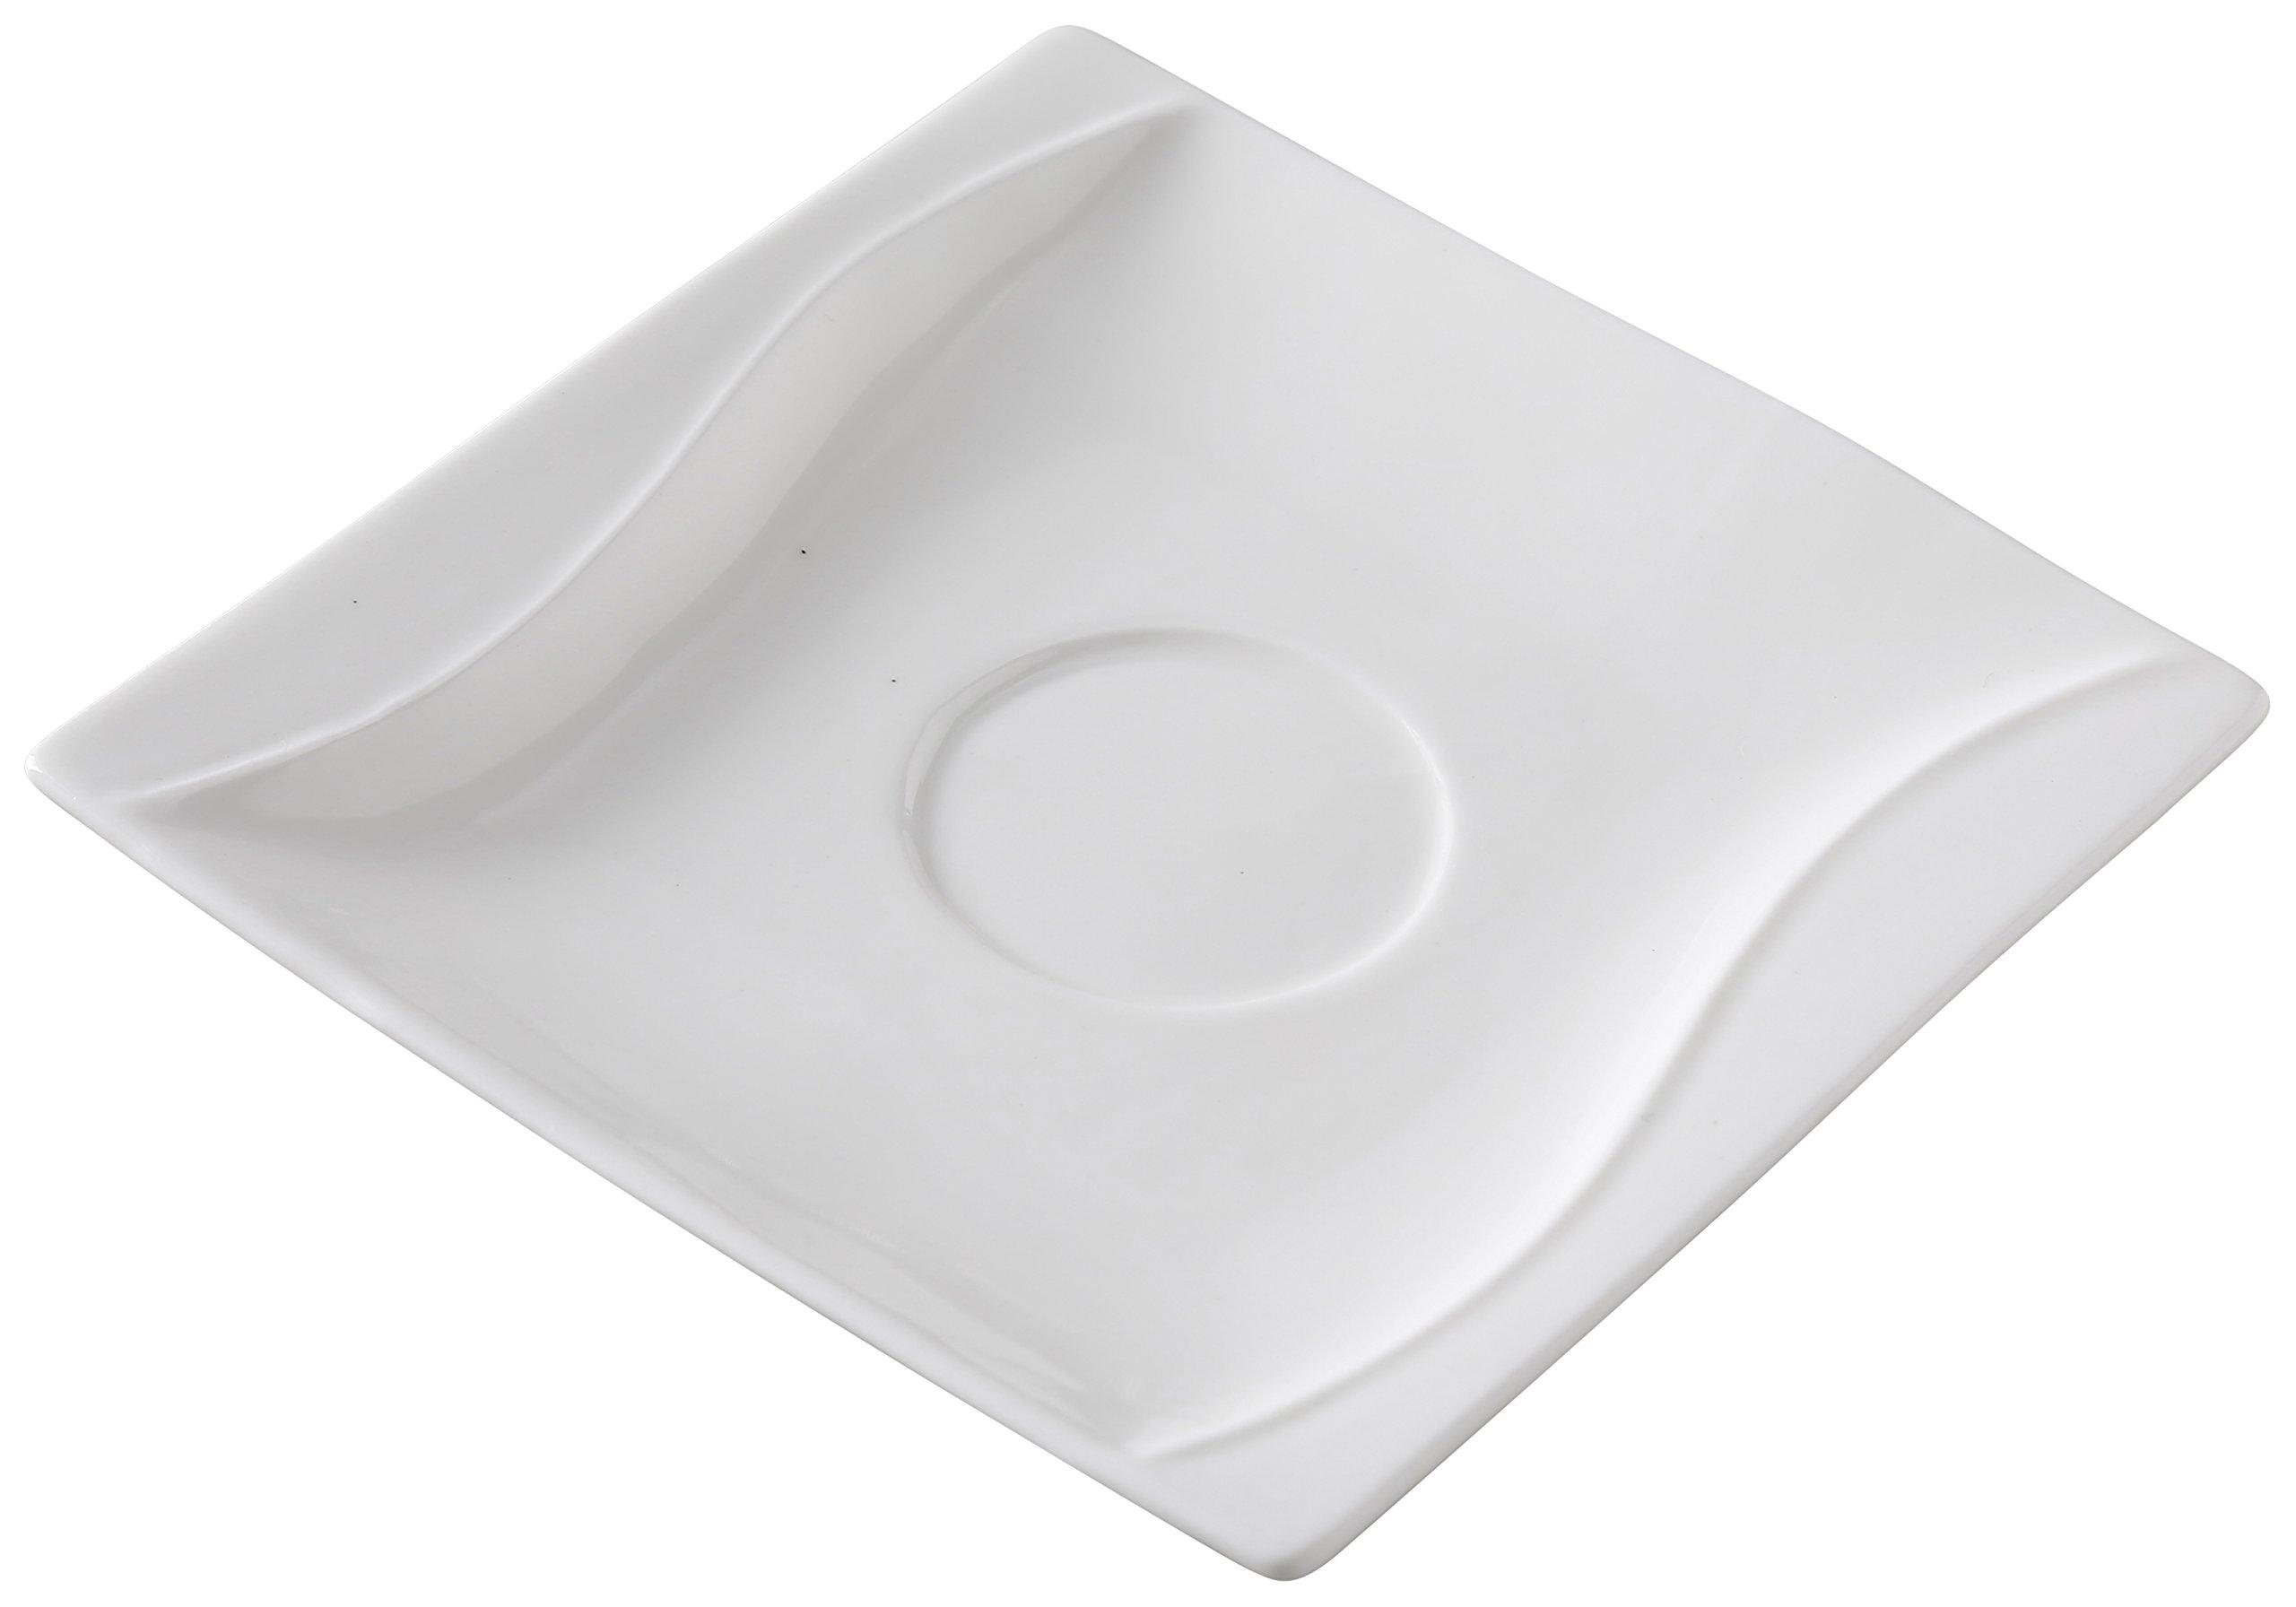 Yanco SW-002 5.5'' Saucer, Square, Porcelain, Bone White, Pack of 36